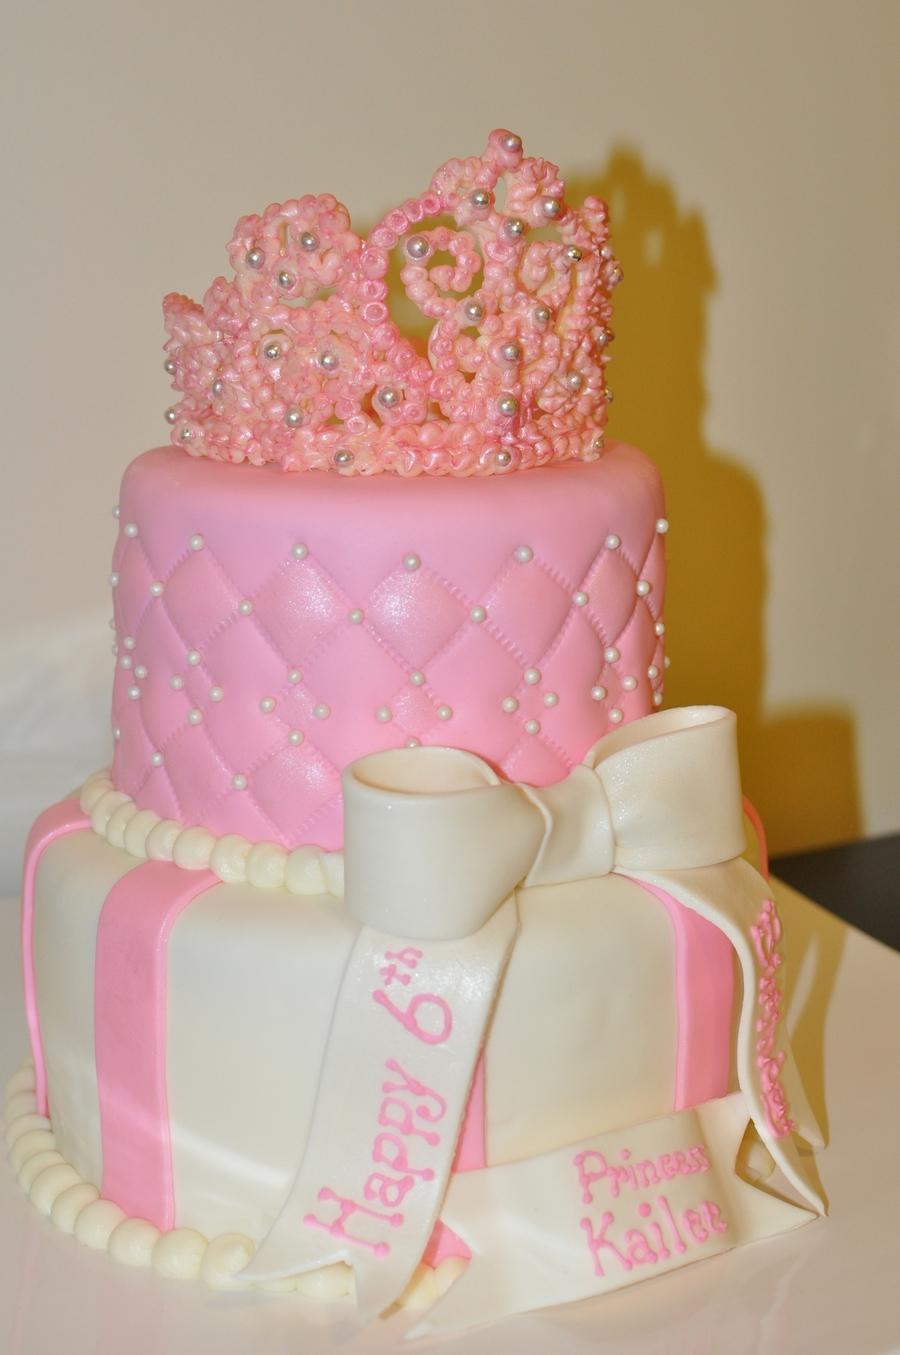 Marvelous Tiara Princess Cakecentral Com Funny Birthday Cards Online Unhofree Goldxyz